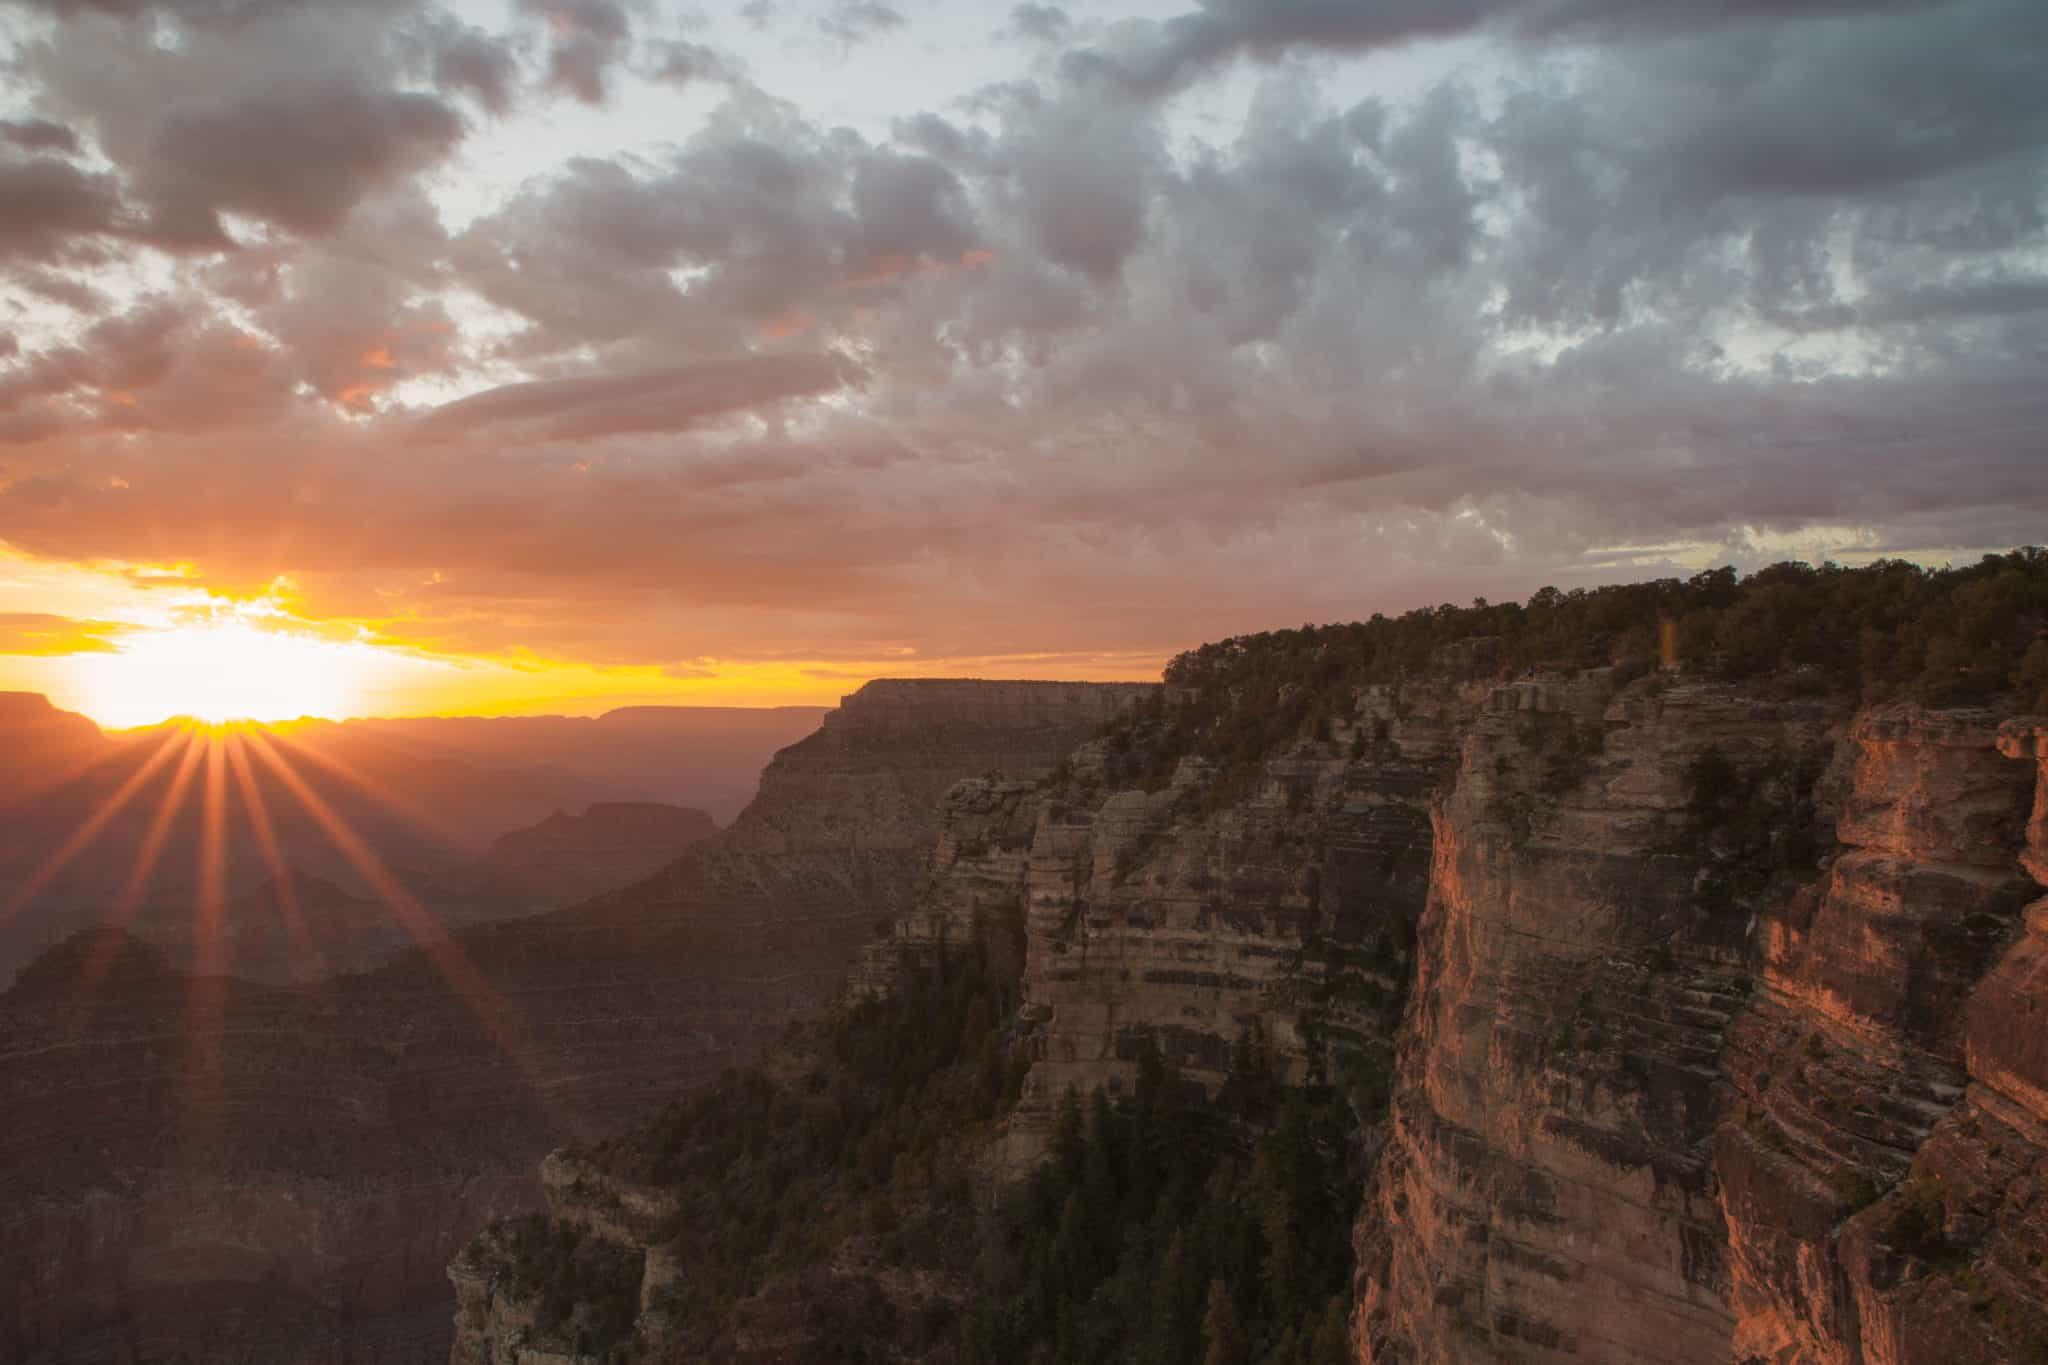 Sunrise over The Grand Canyon, Arizona, USA